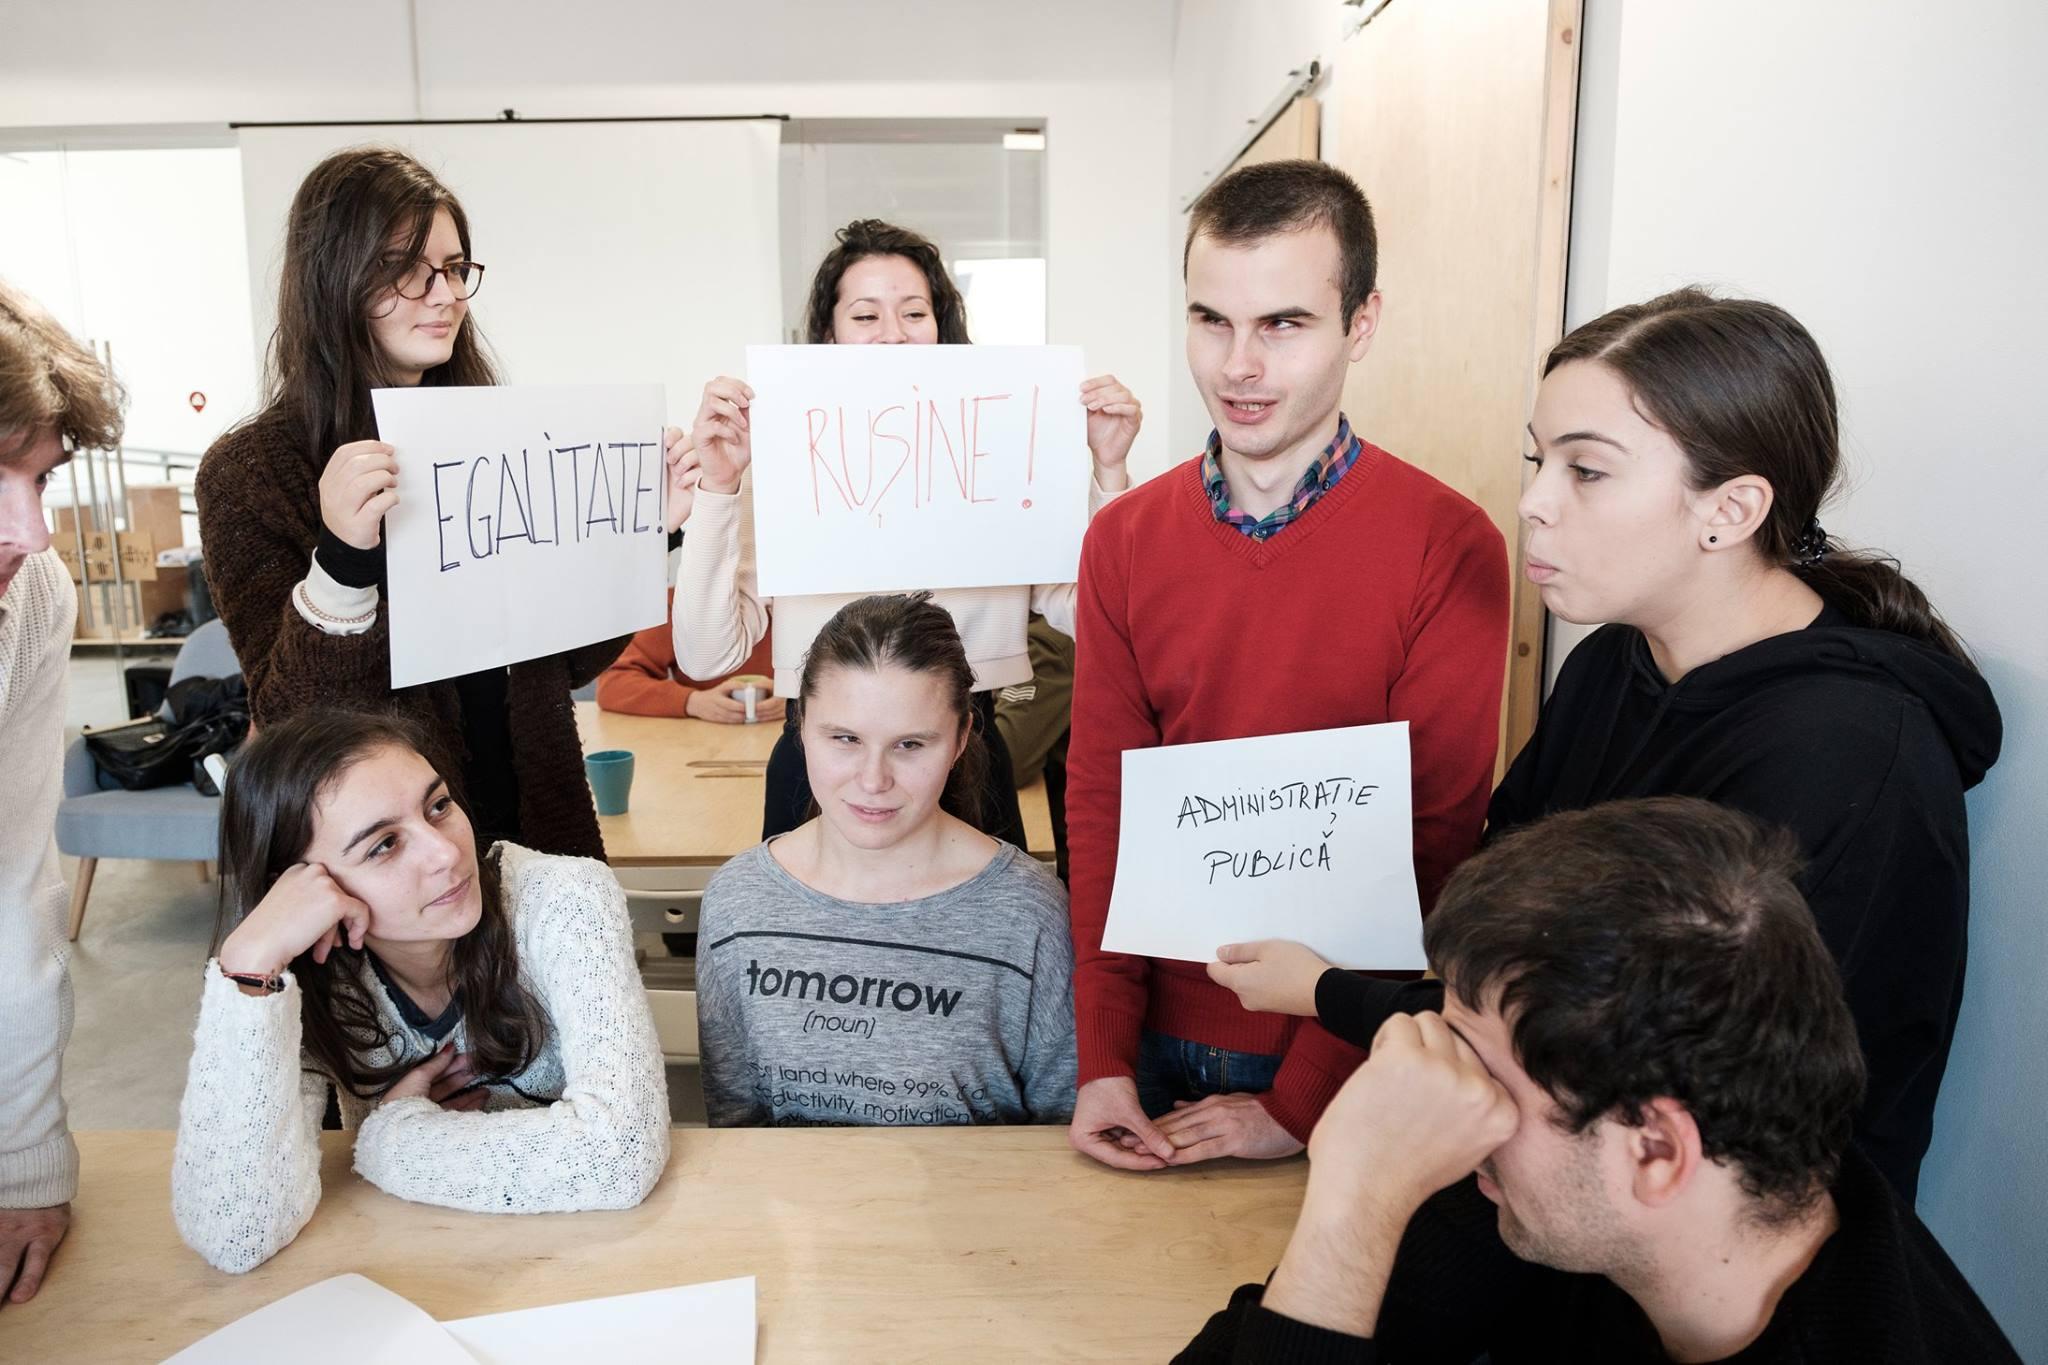 "Descriere foto: reprezentanti ai societatii civile protesteaza cu mesaje ""Egalitate"" si ""Rusine"", in cadrul exercitiului."